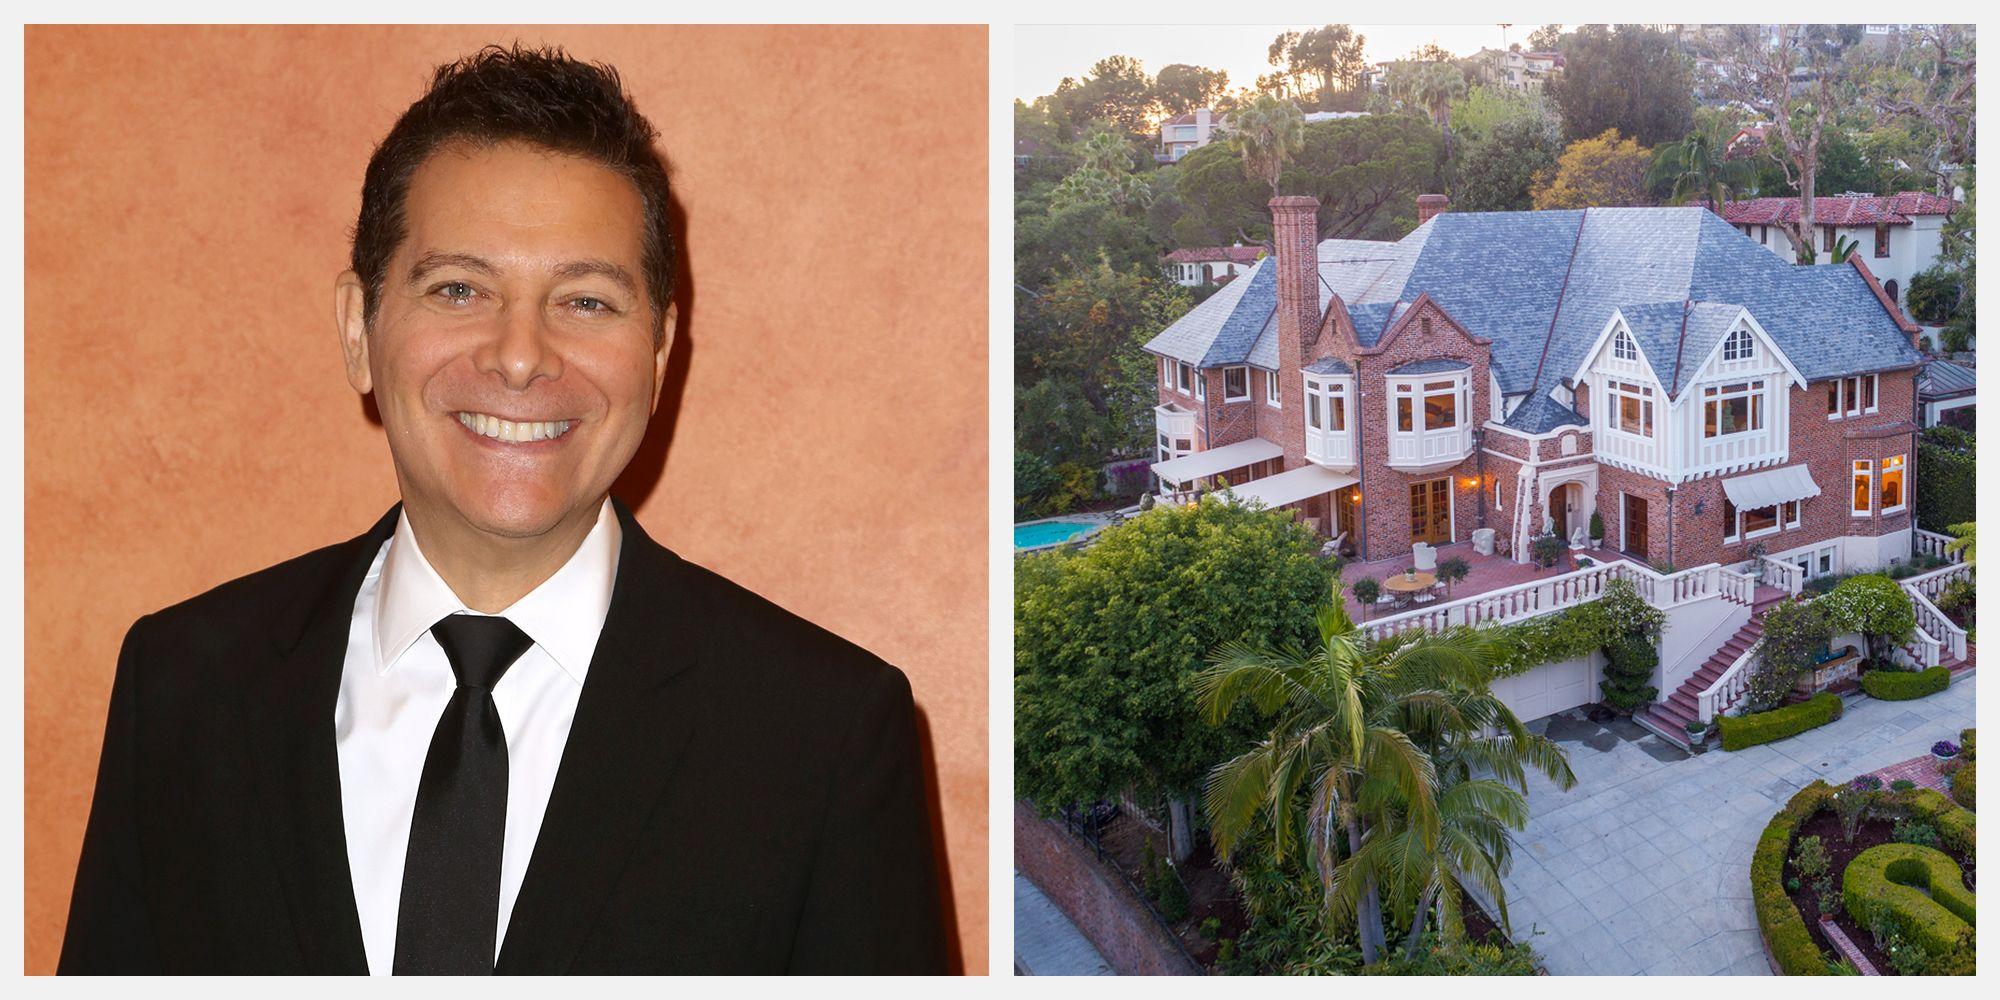 Singer Michael Feinstein Relists His Historic Los Feliz Mansion for $18.9 Million